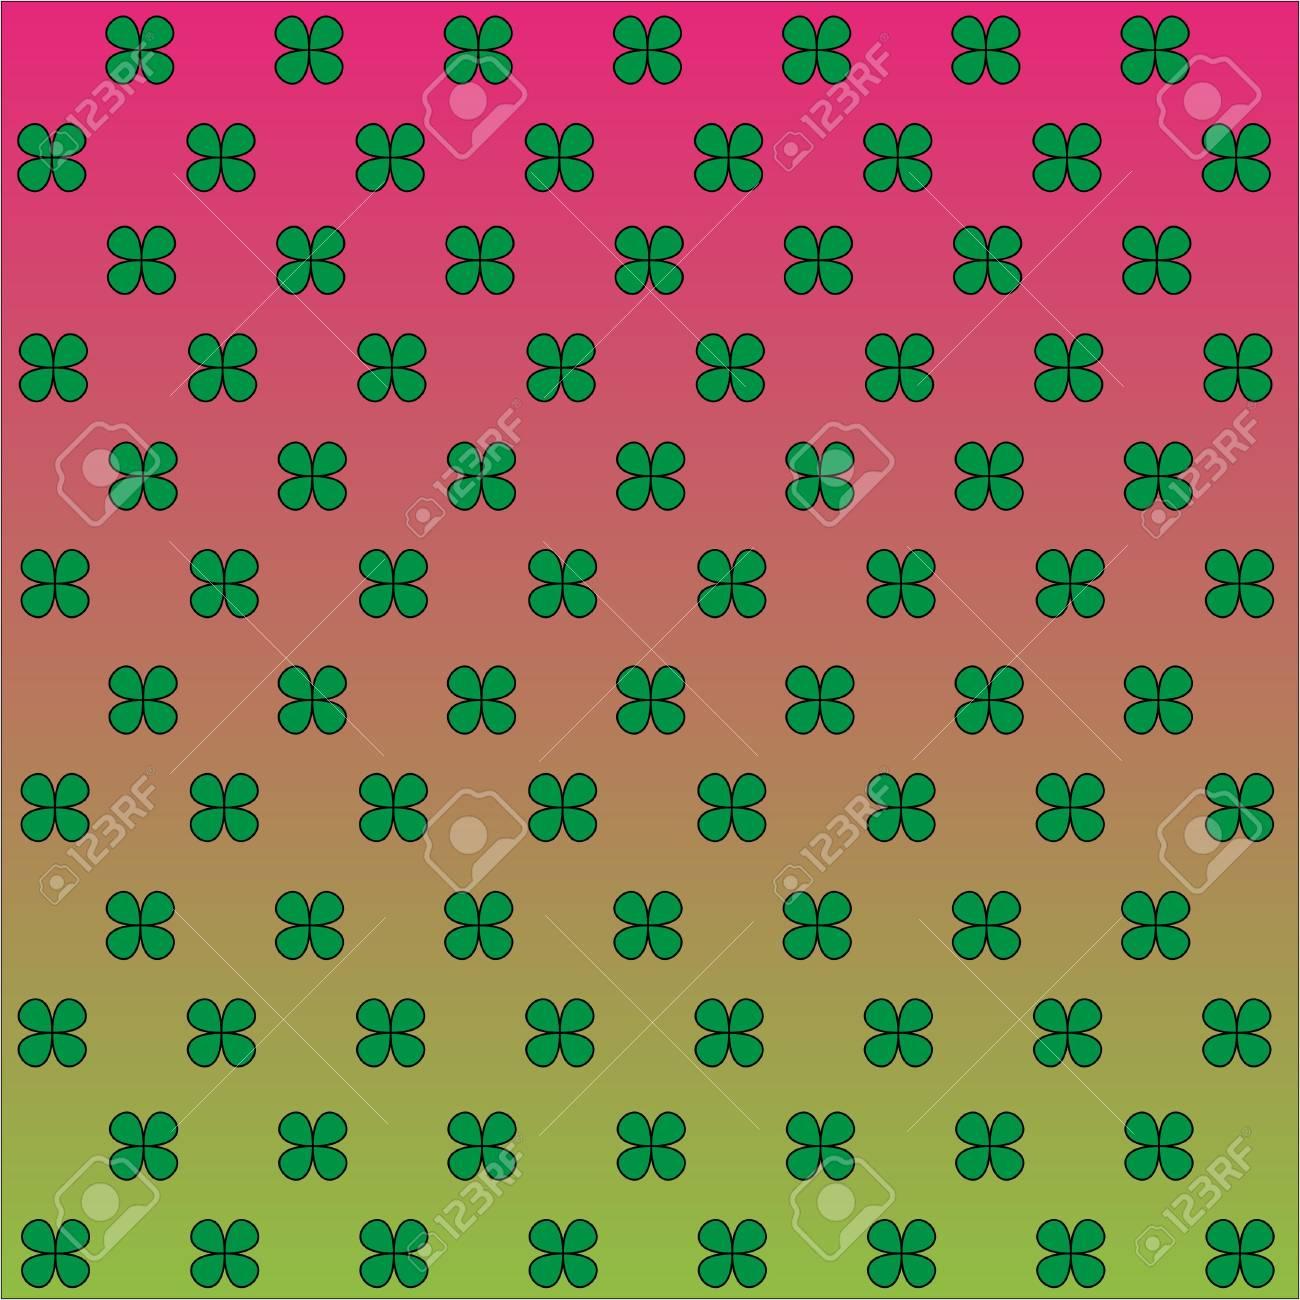 Four leaf clover illustration like background Stock Photo - 4625015